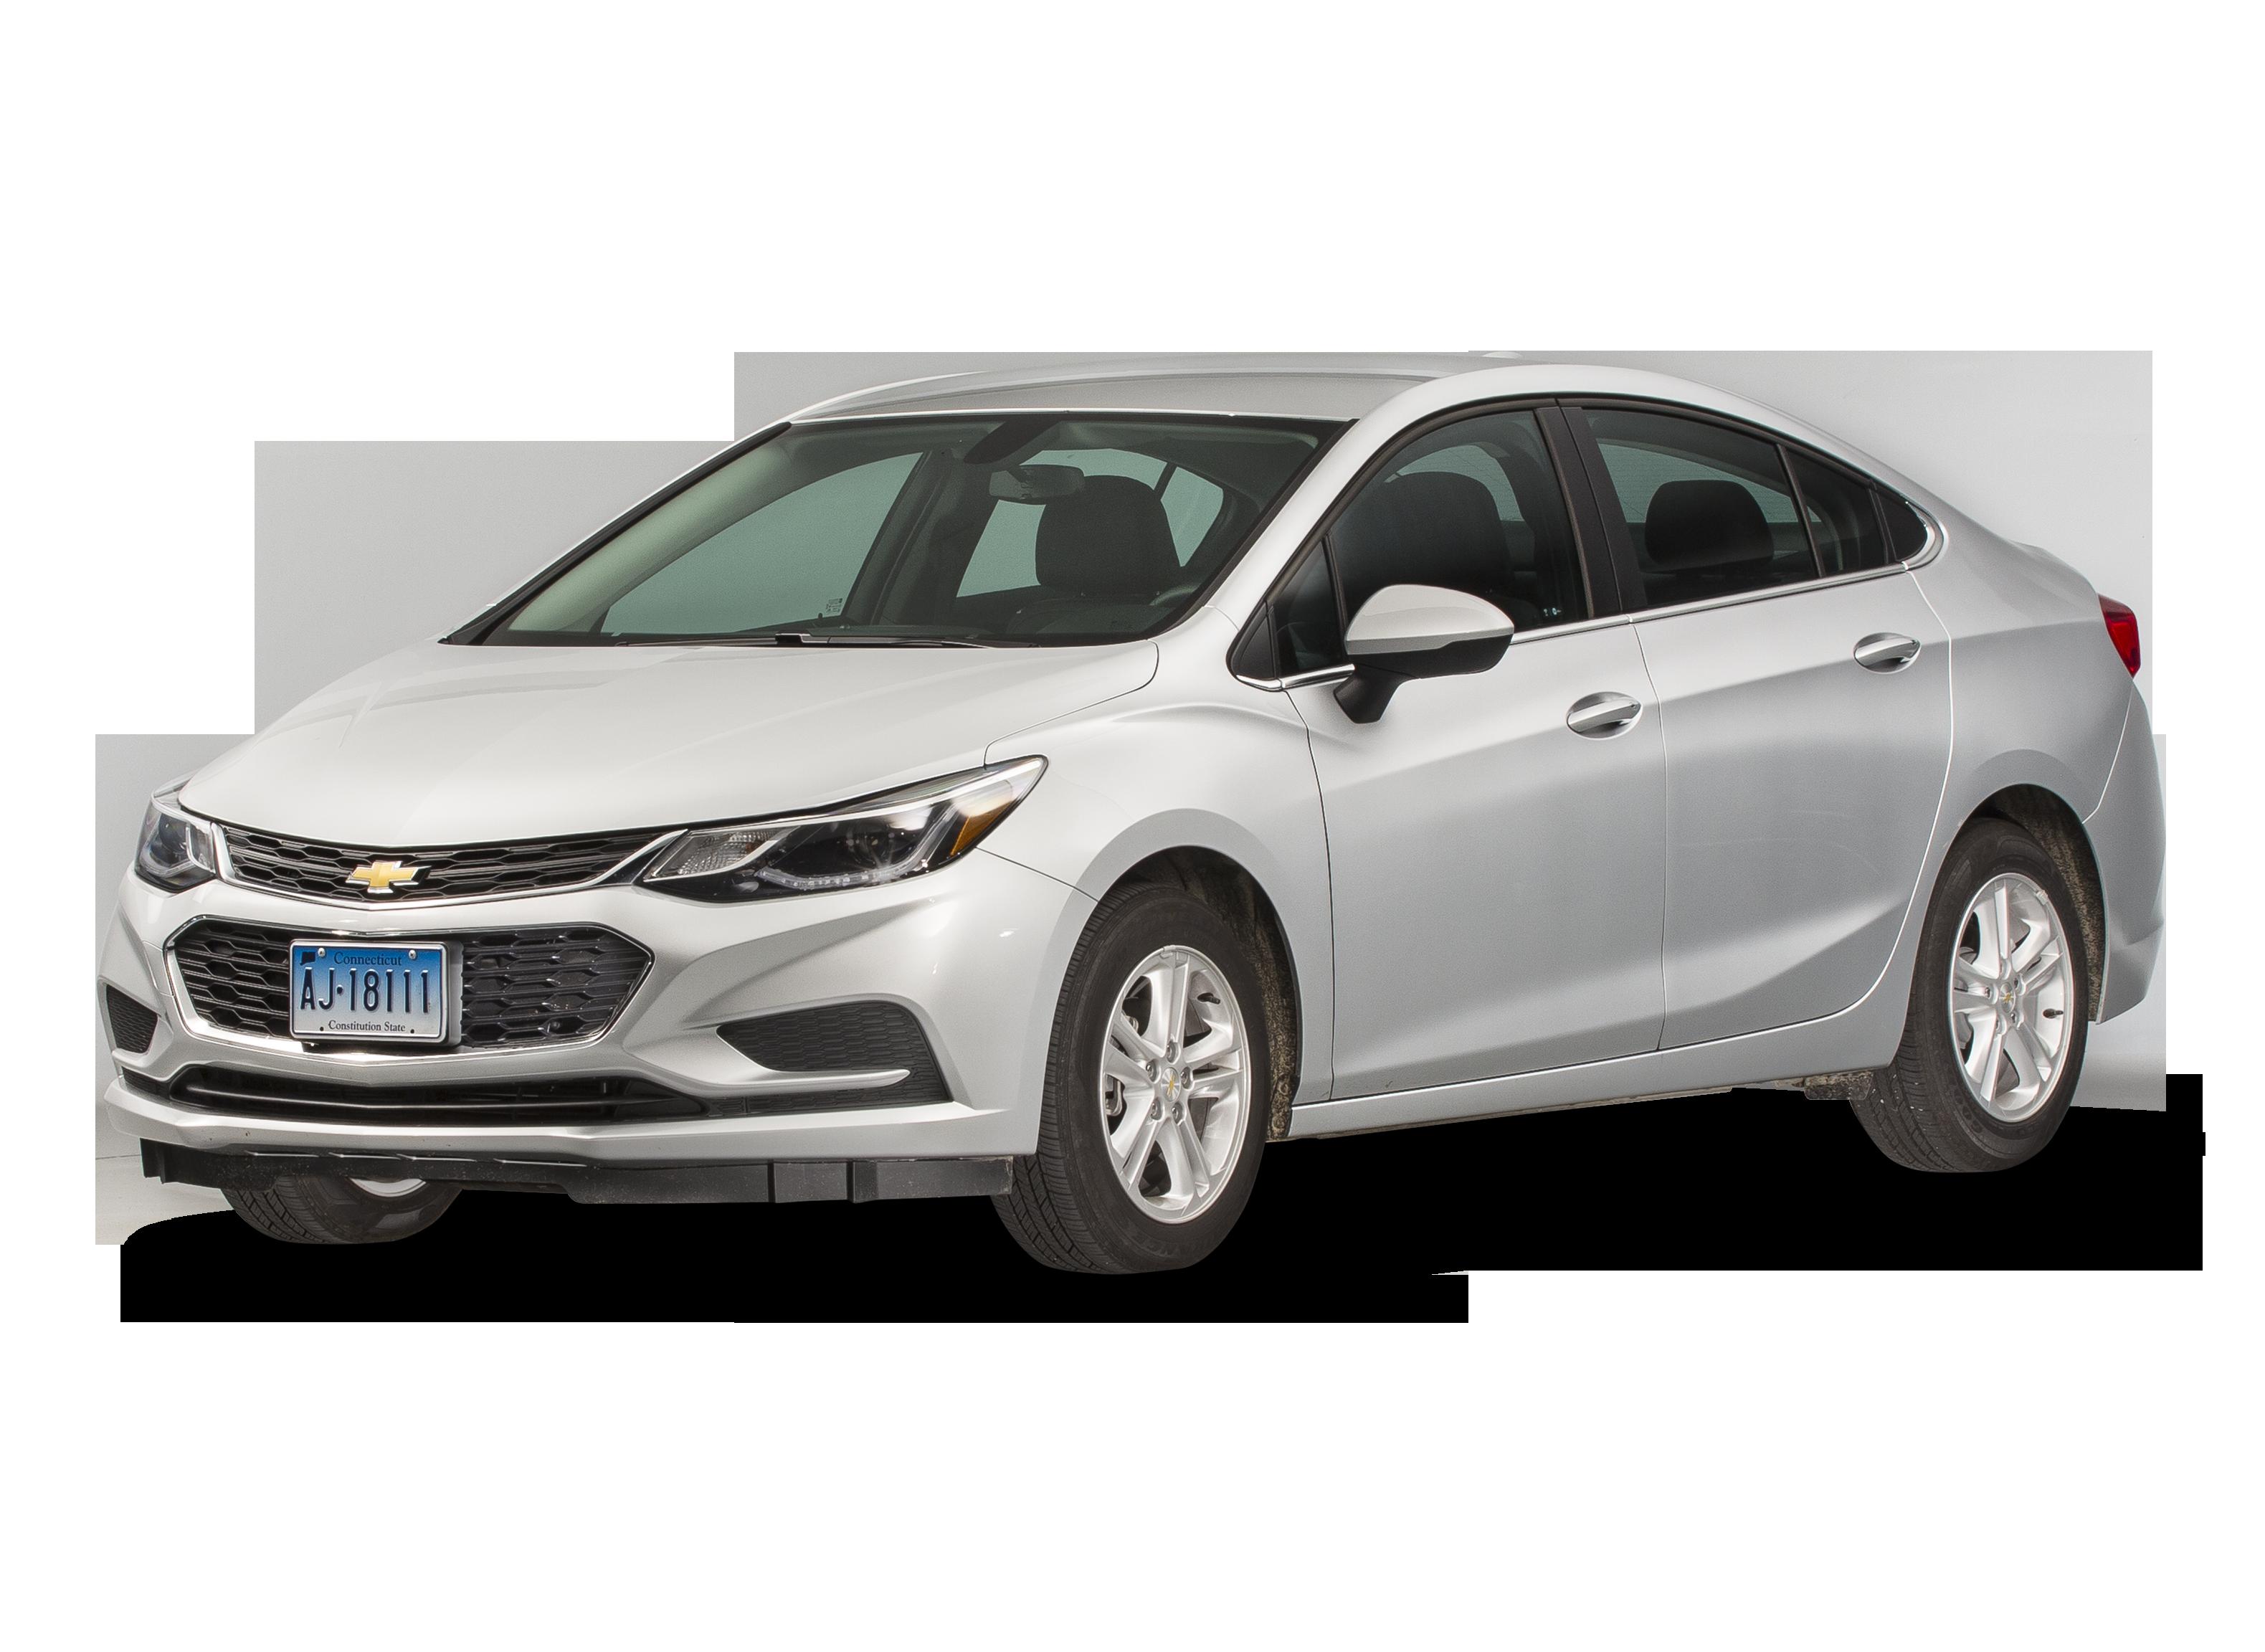 Chevrolet. Cruze. Ford  sc 1 st  Consumer Reports & Best Small Car Reviews u2013 Consumer Reports markmcfarlin.com